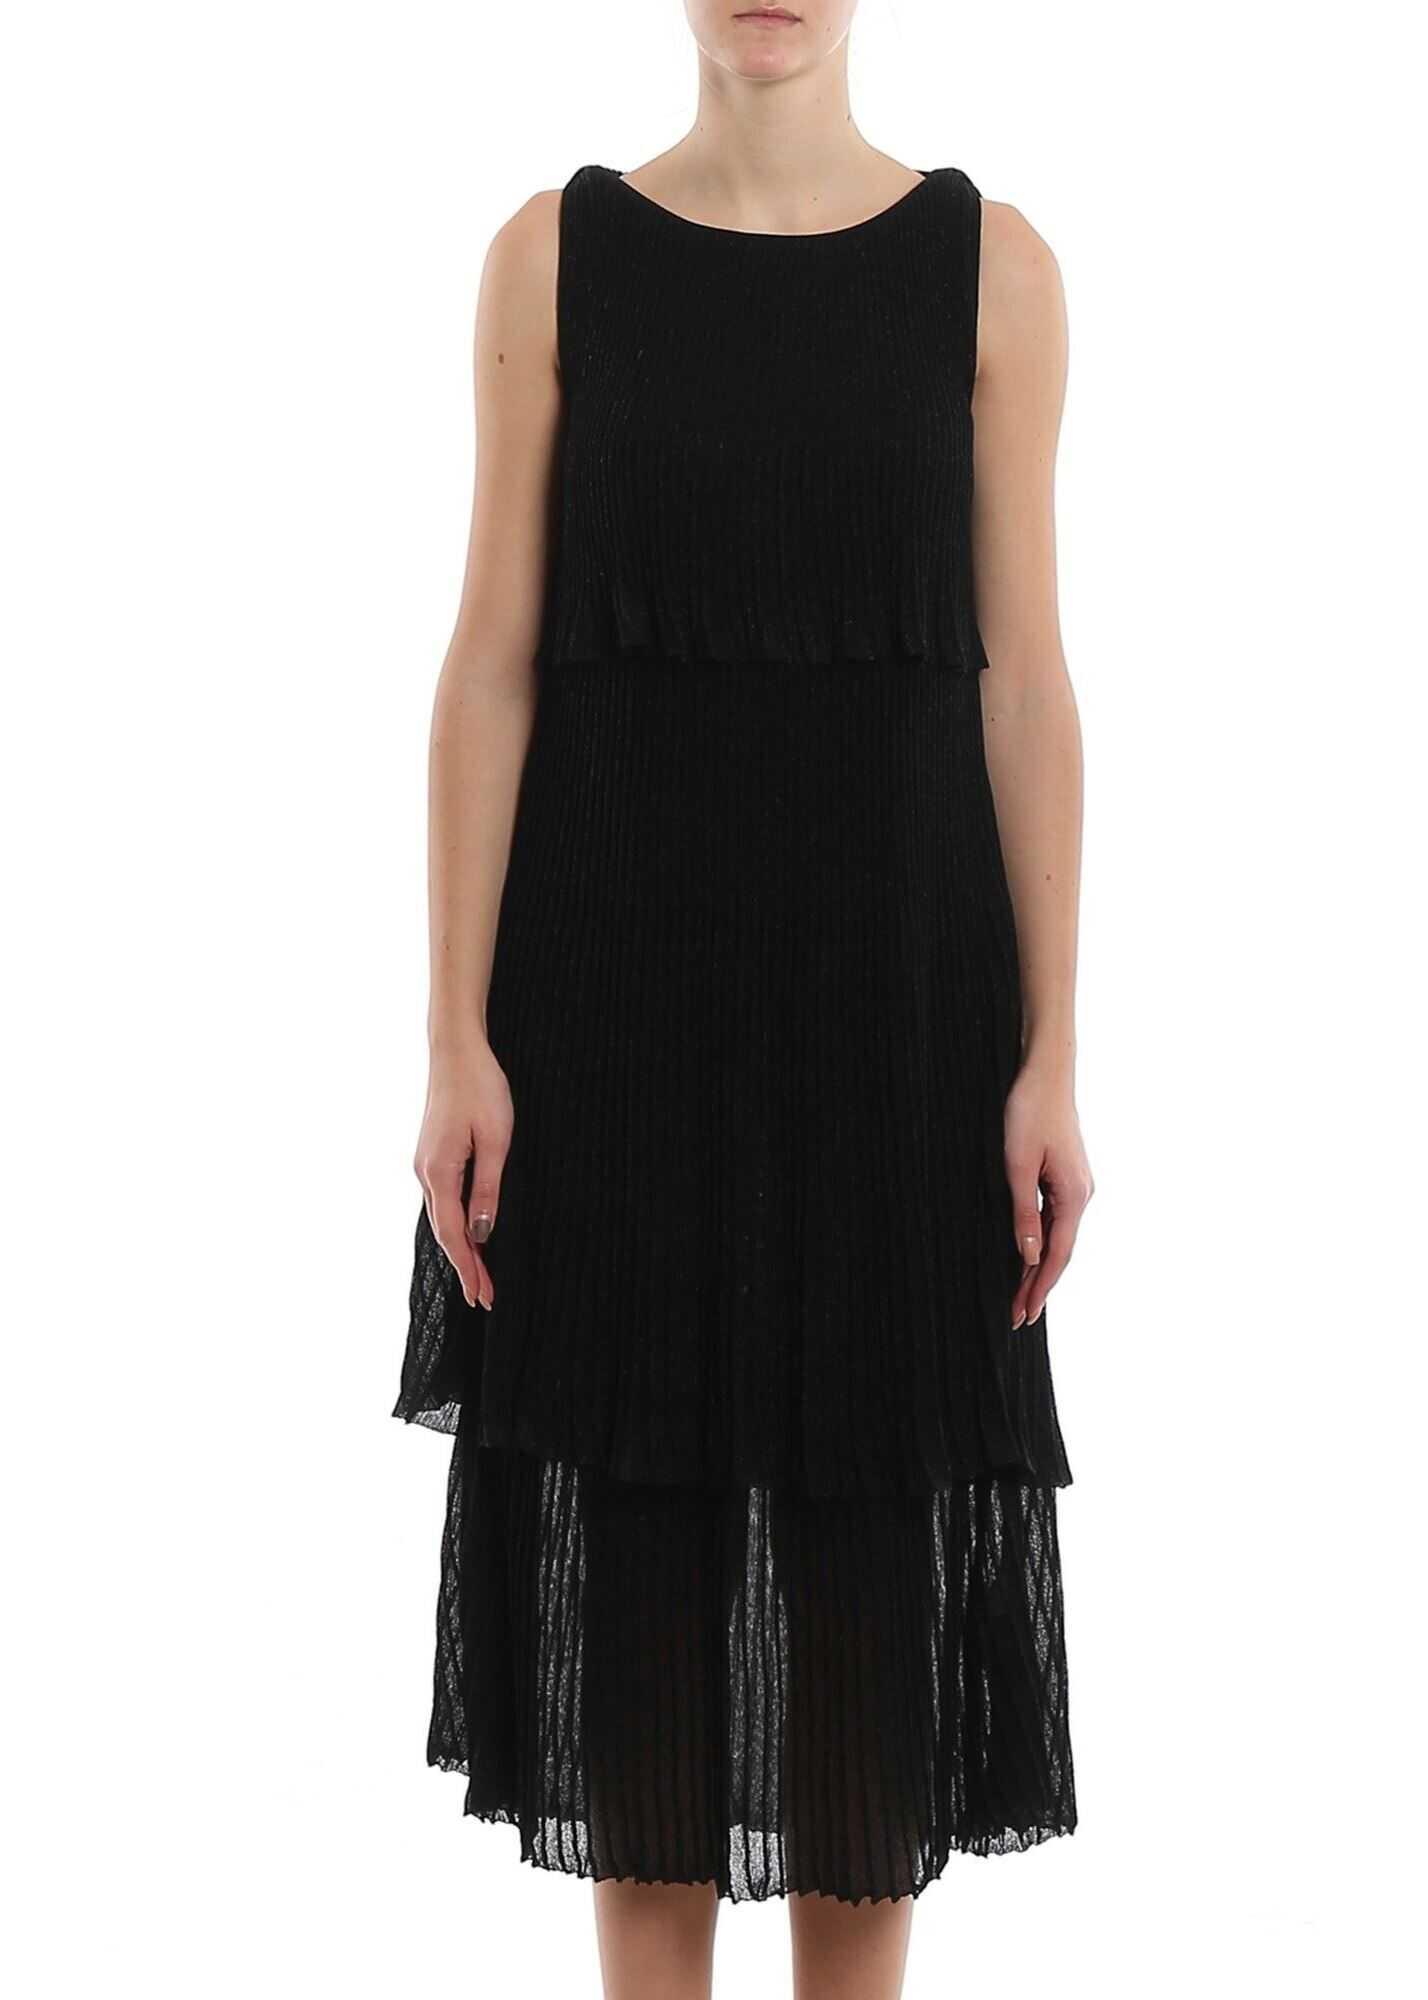 Be Blumarine Lurex Flounced Sleeveless Dress Black